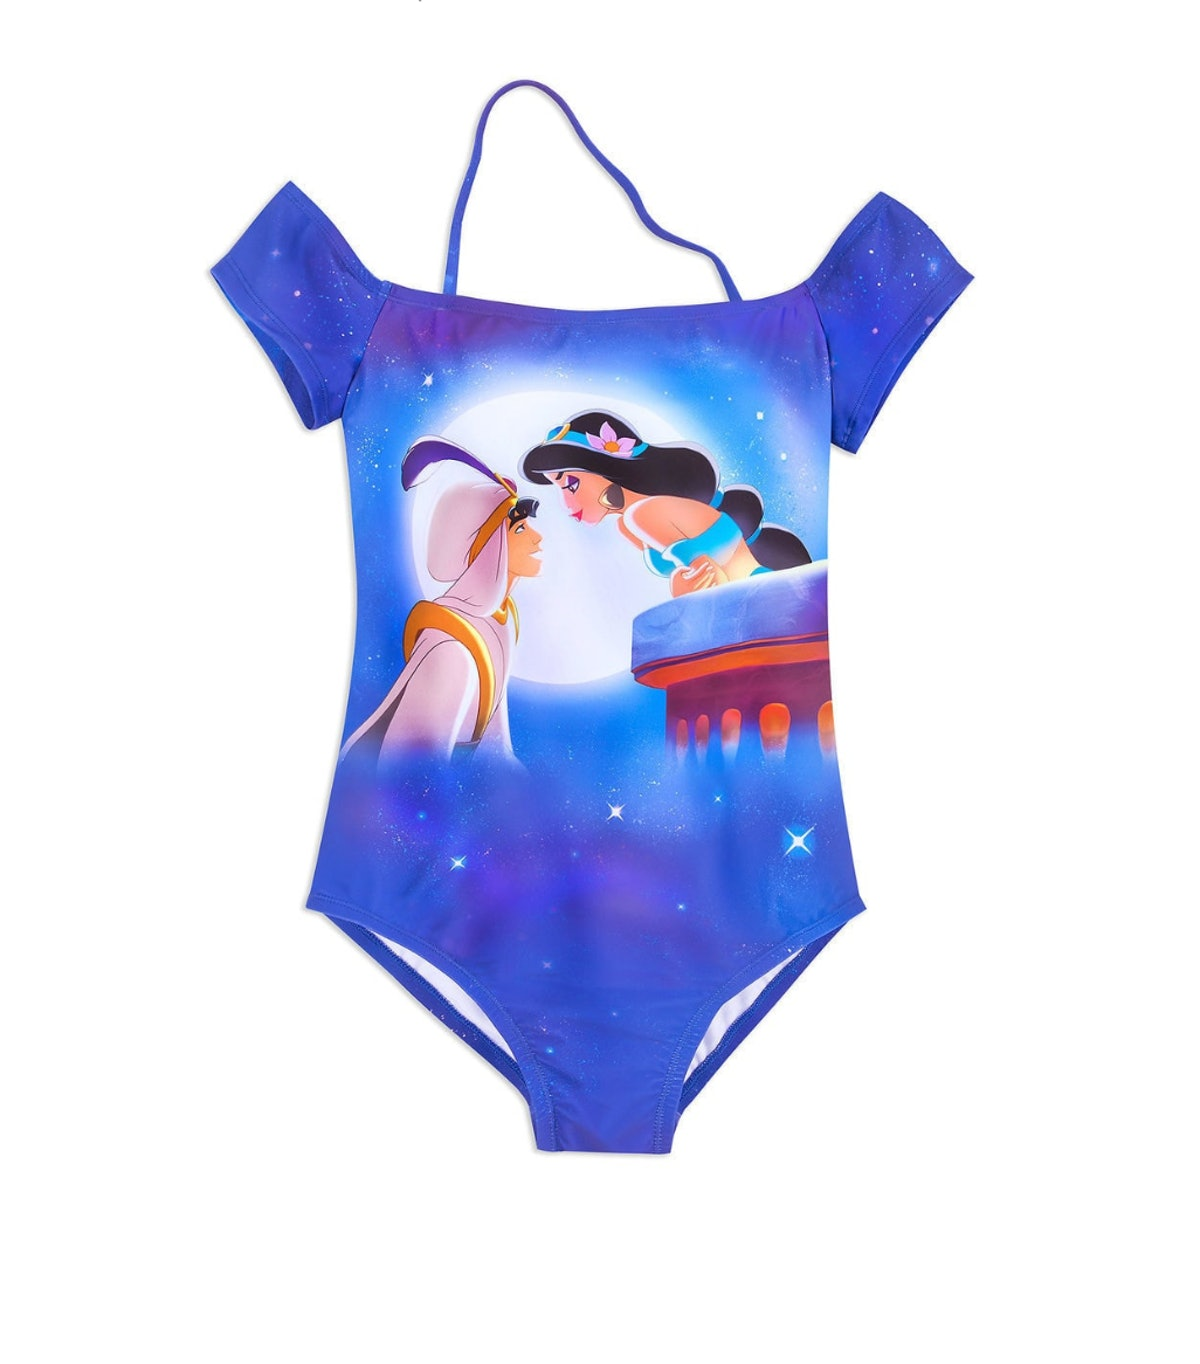 Aladdin Swimsuit for Women - Oh My Disney